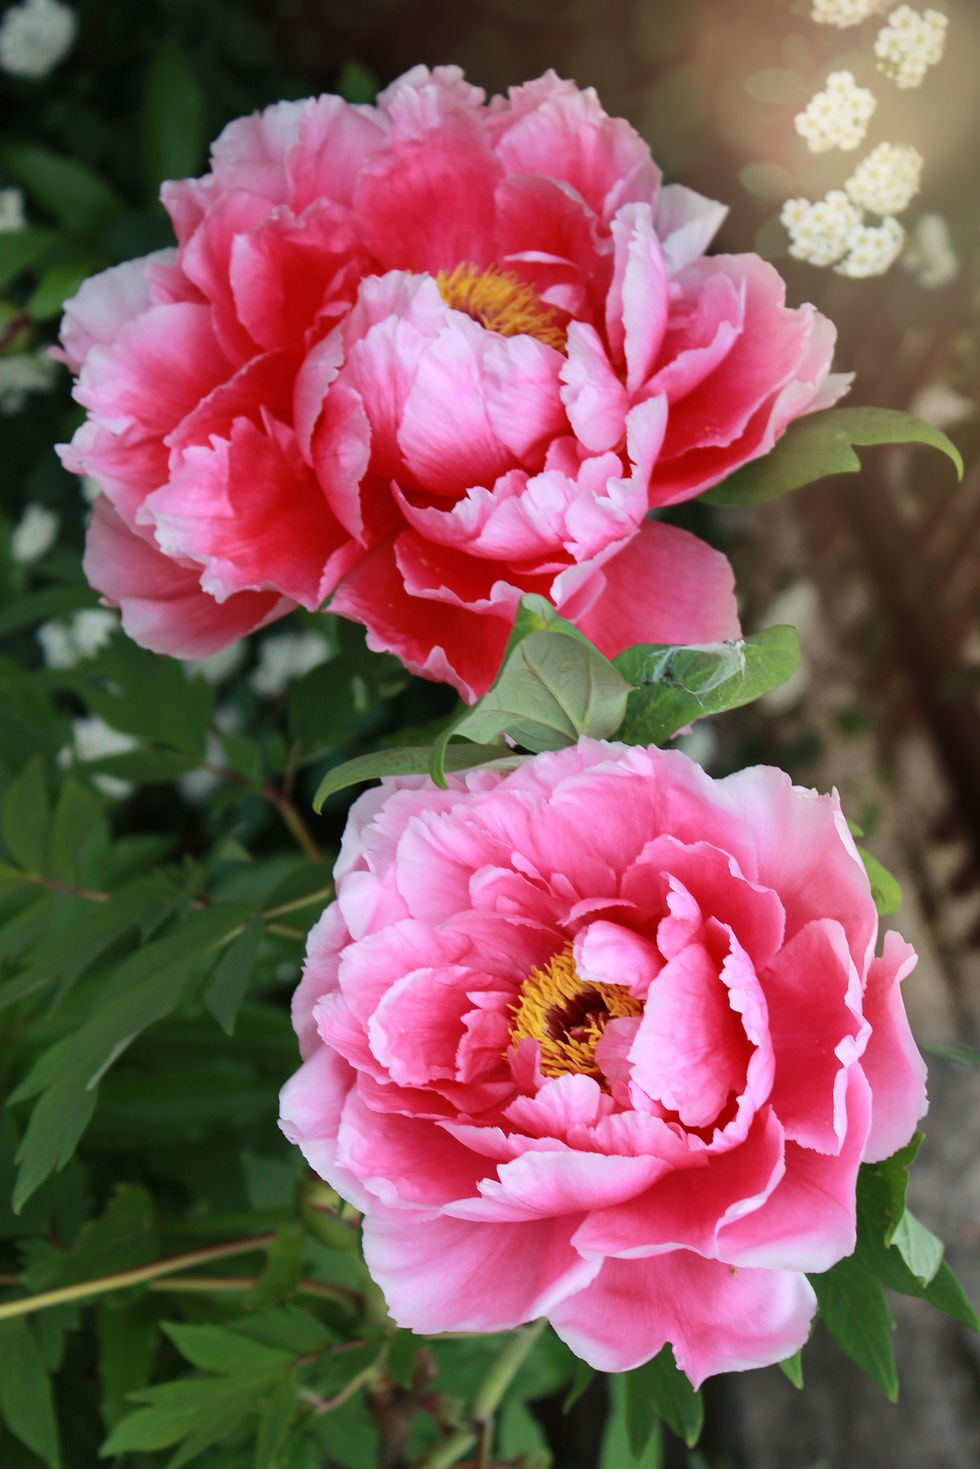 Light Pink Flowers Aesthetic